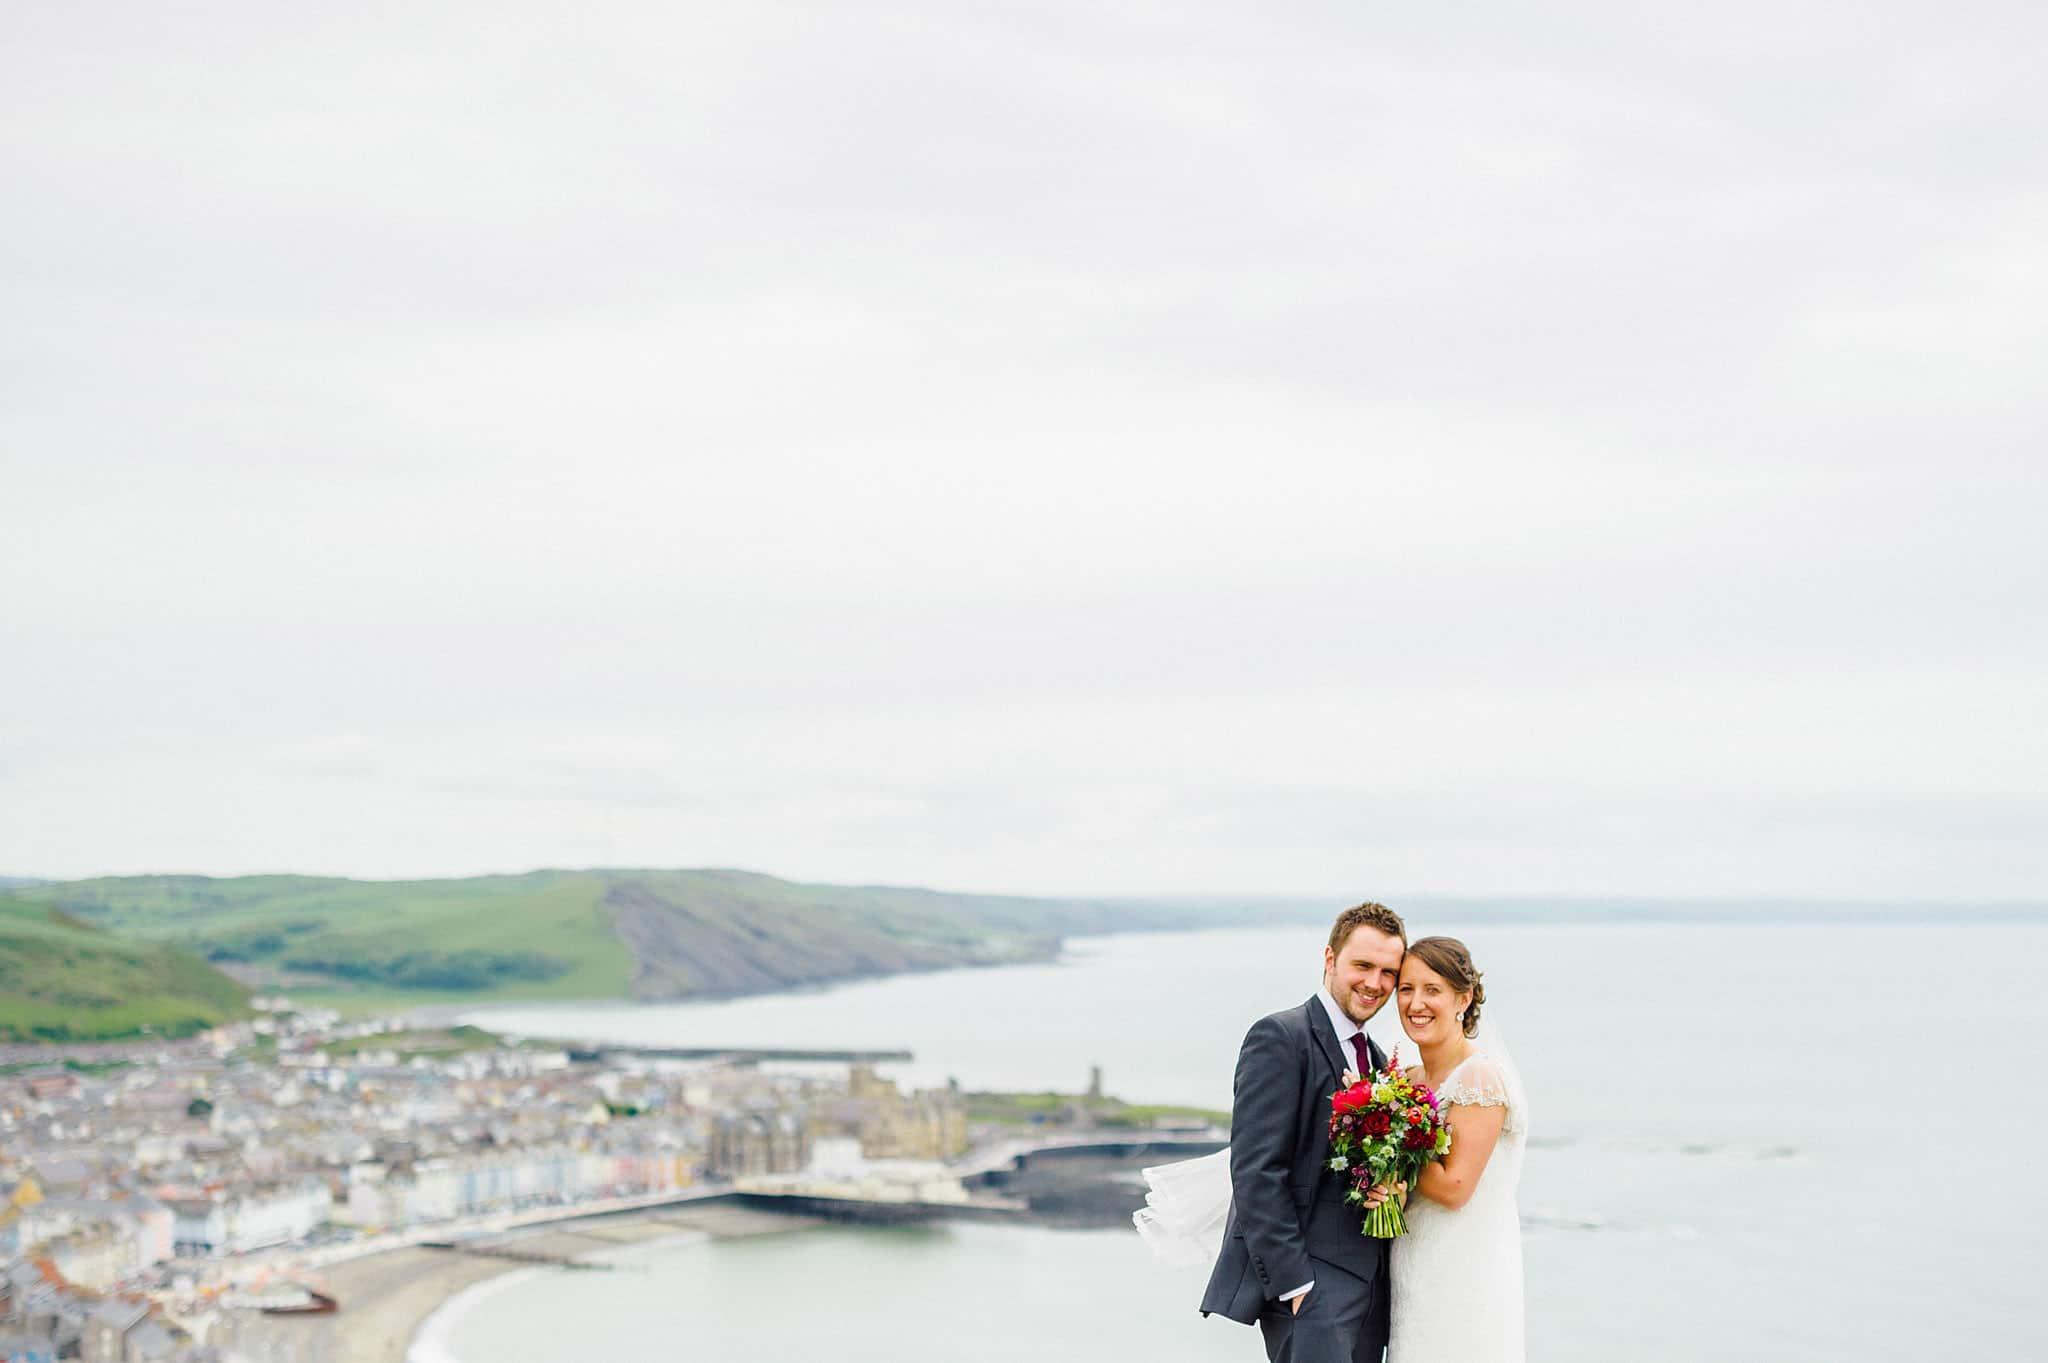 wedding-photographer-aberystwyth-wales (166)